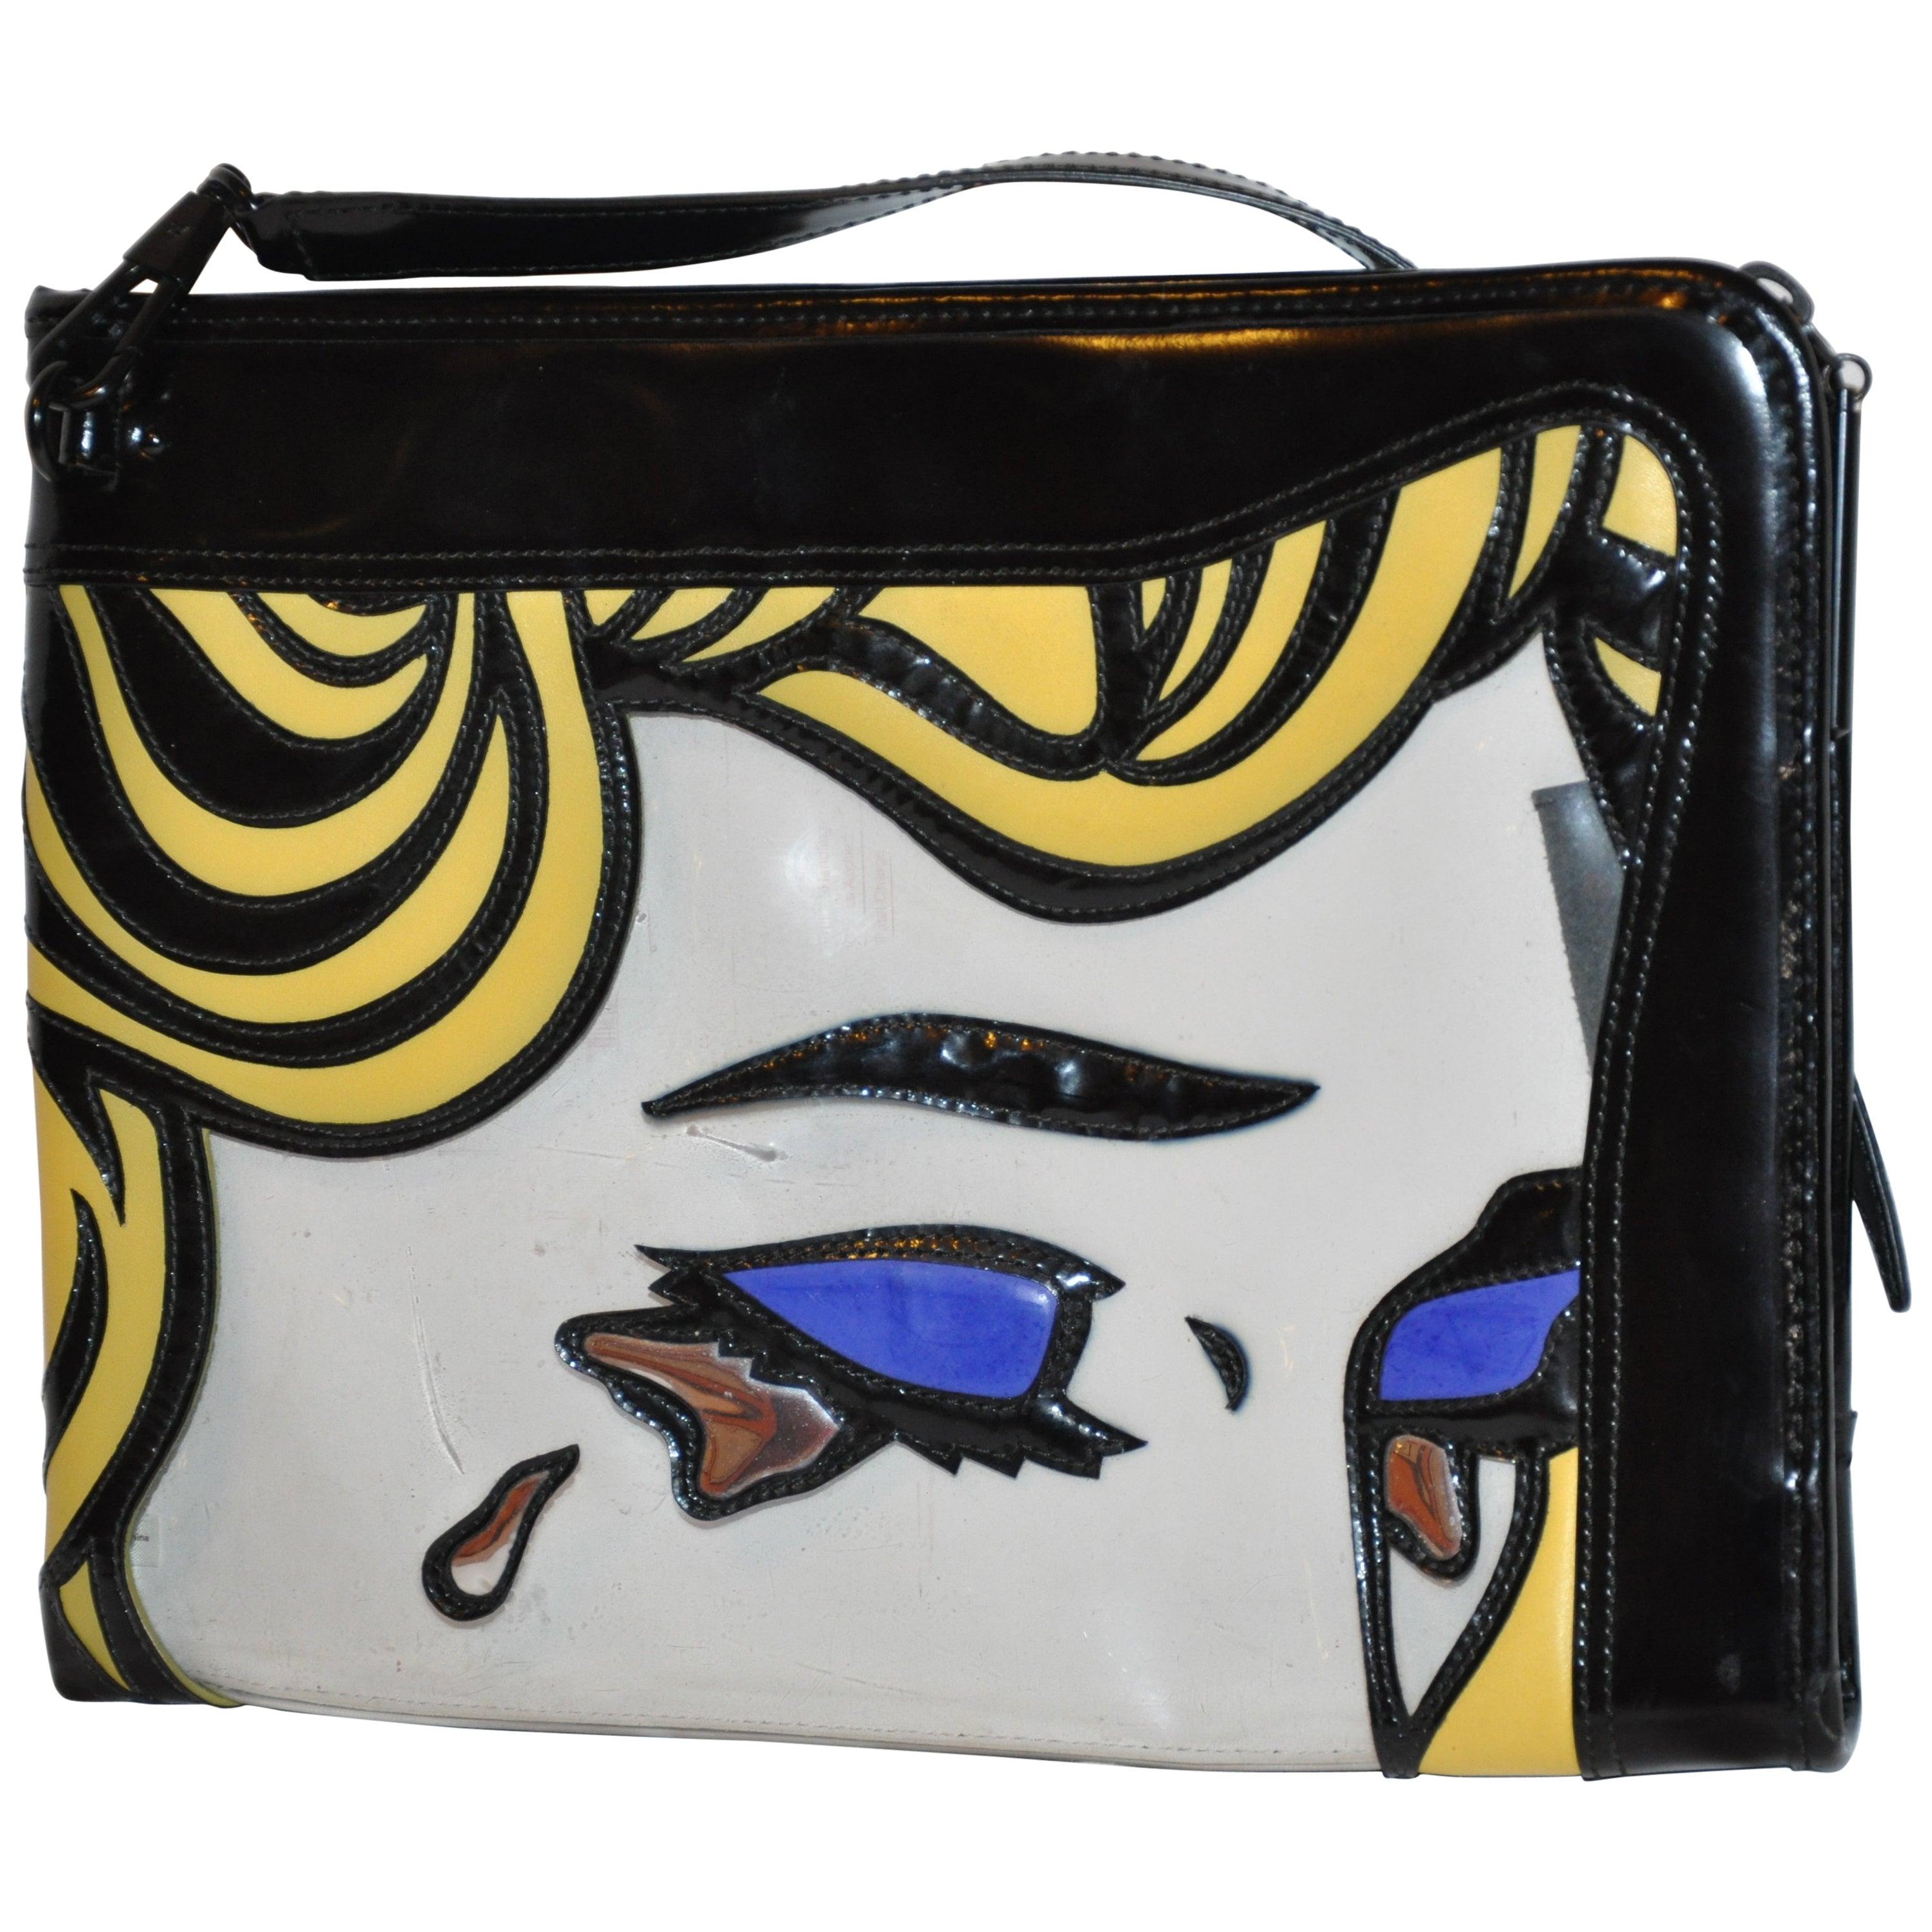 Phillip Lim Limited Edition Golden Tears Portrait Clutch and Shoulder Bag